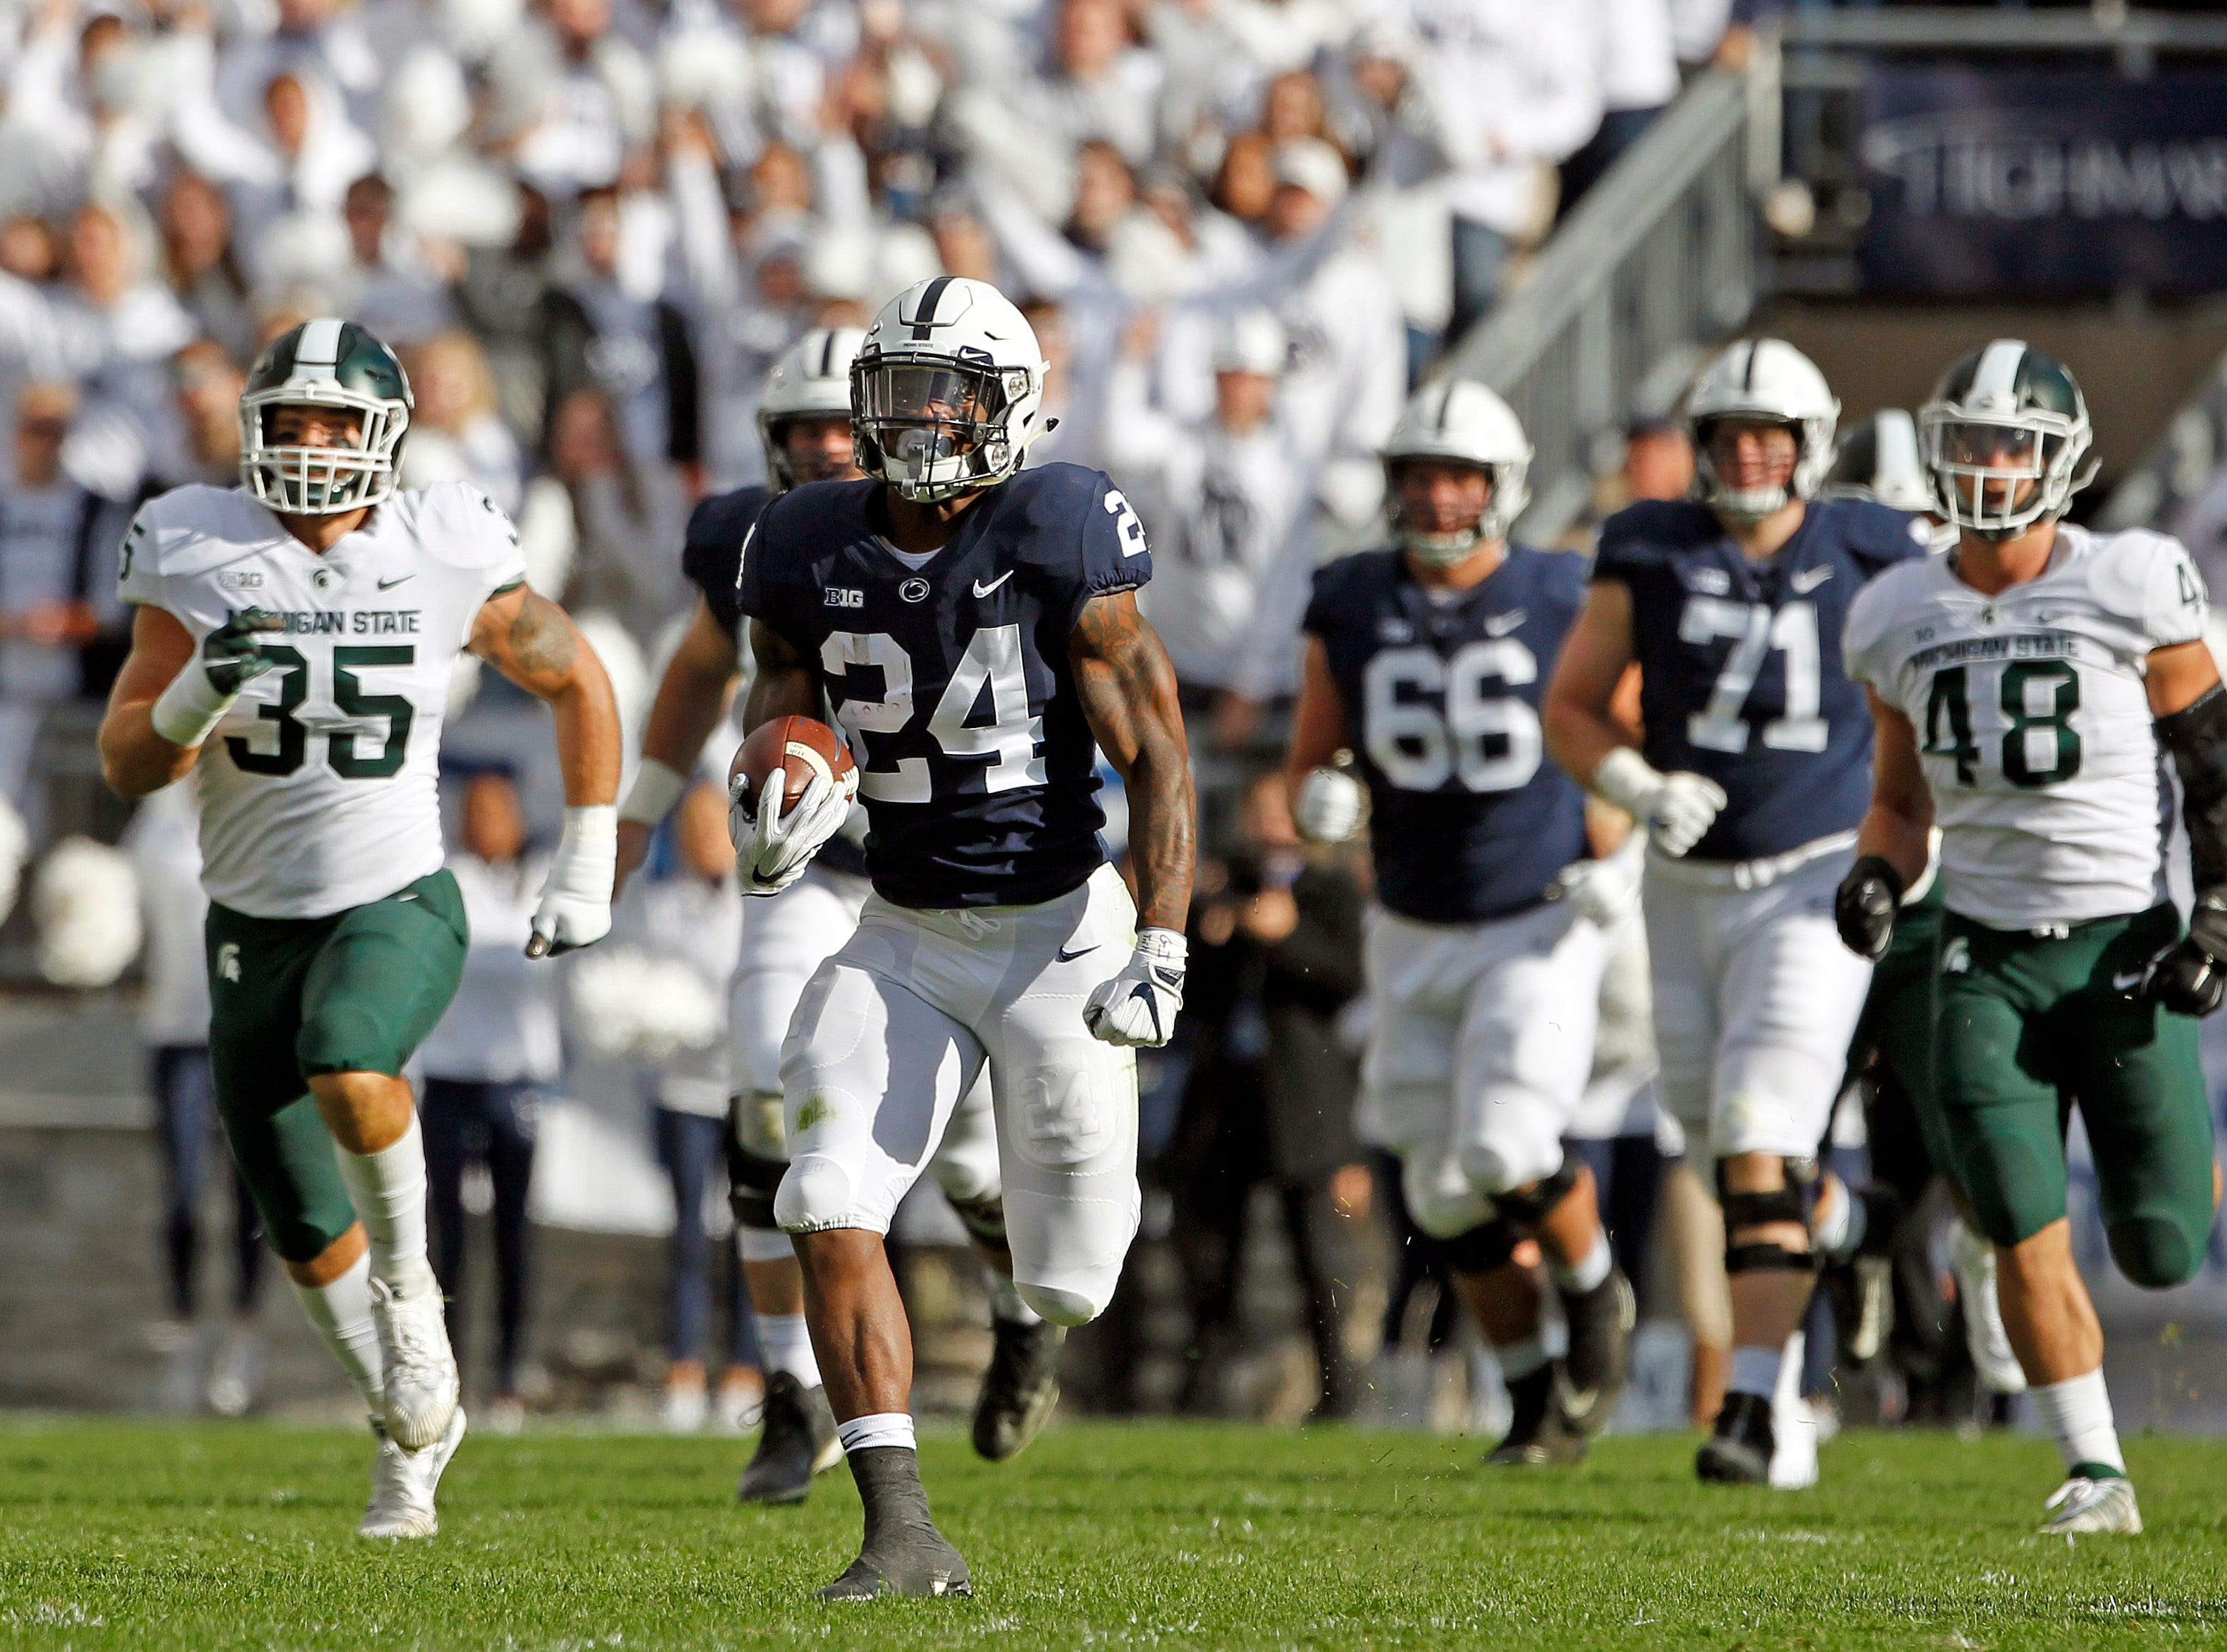 Penn State's Miles Sanders breaks off a long run against Michigan State.